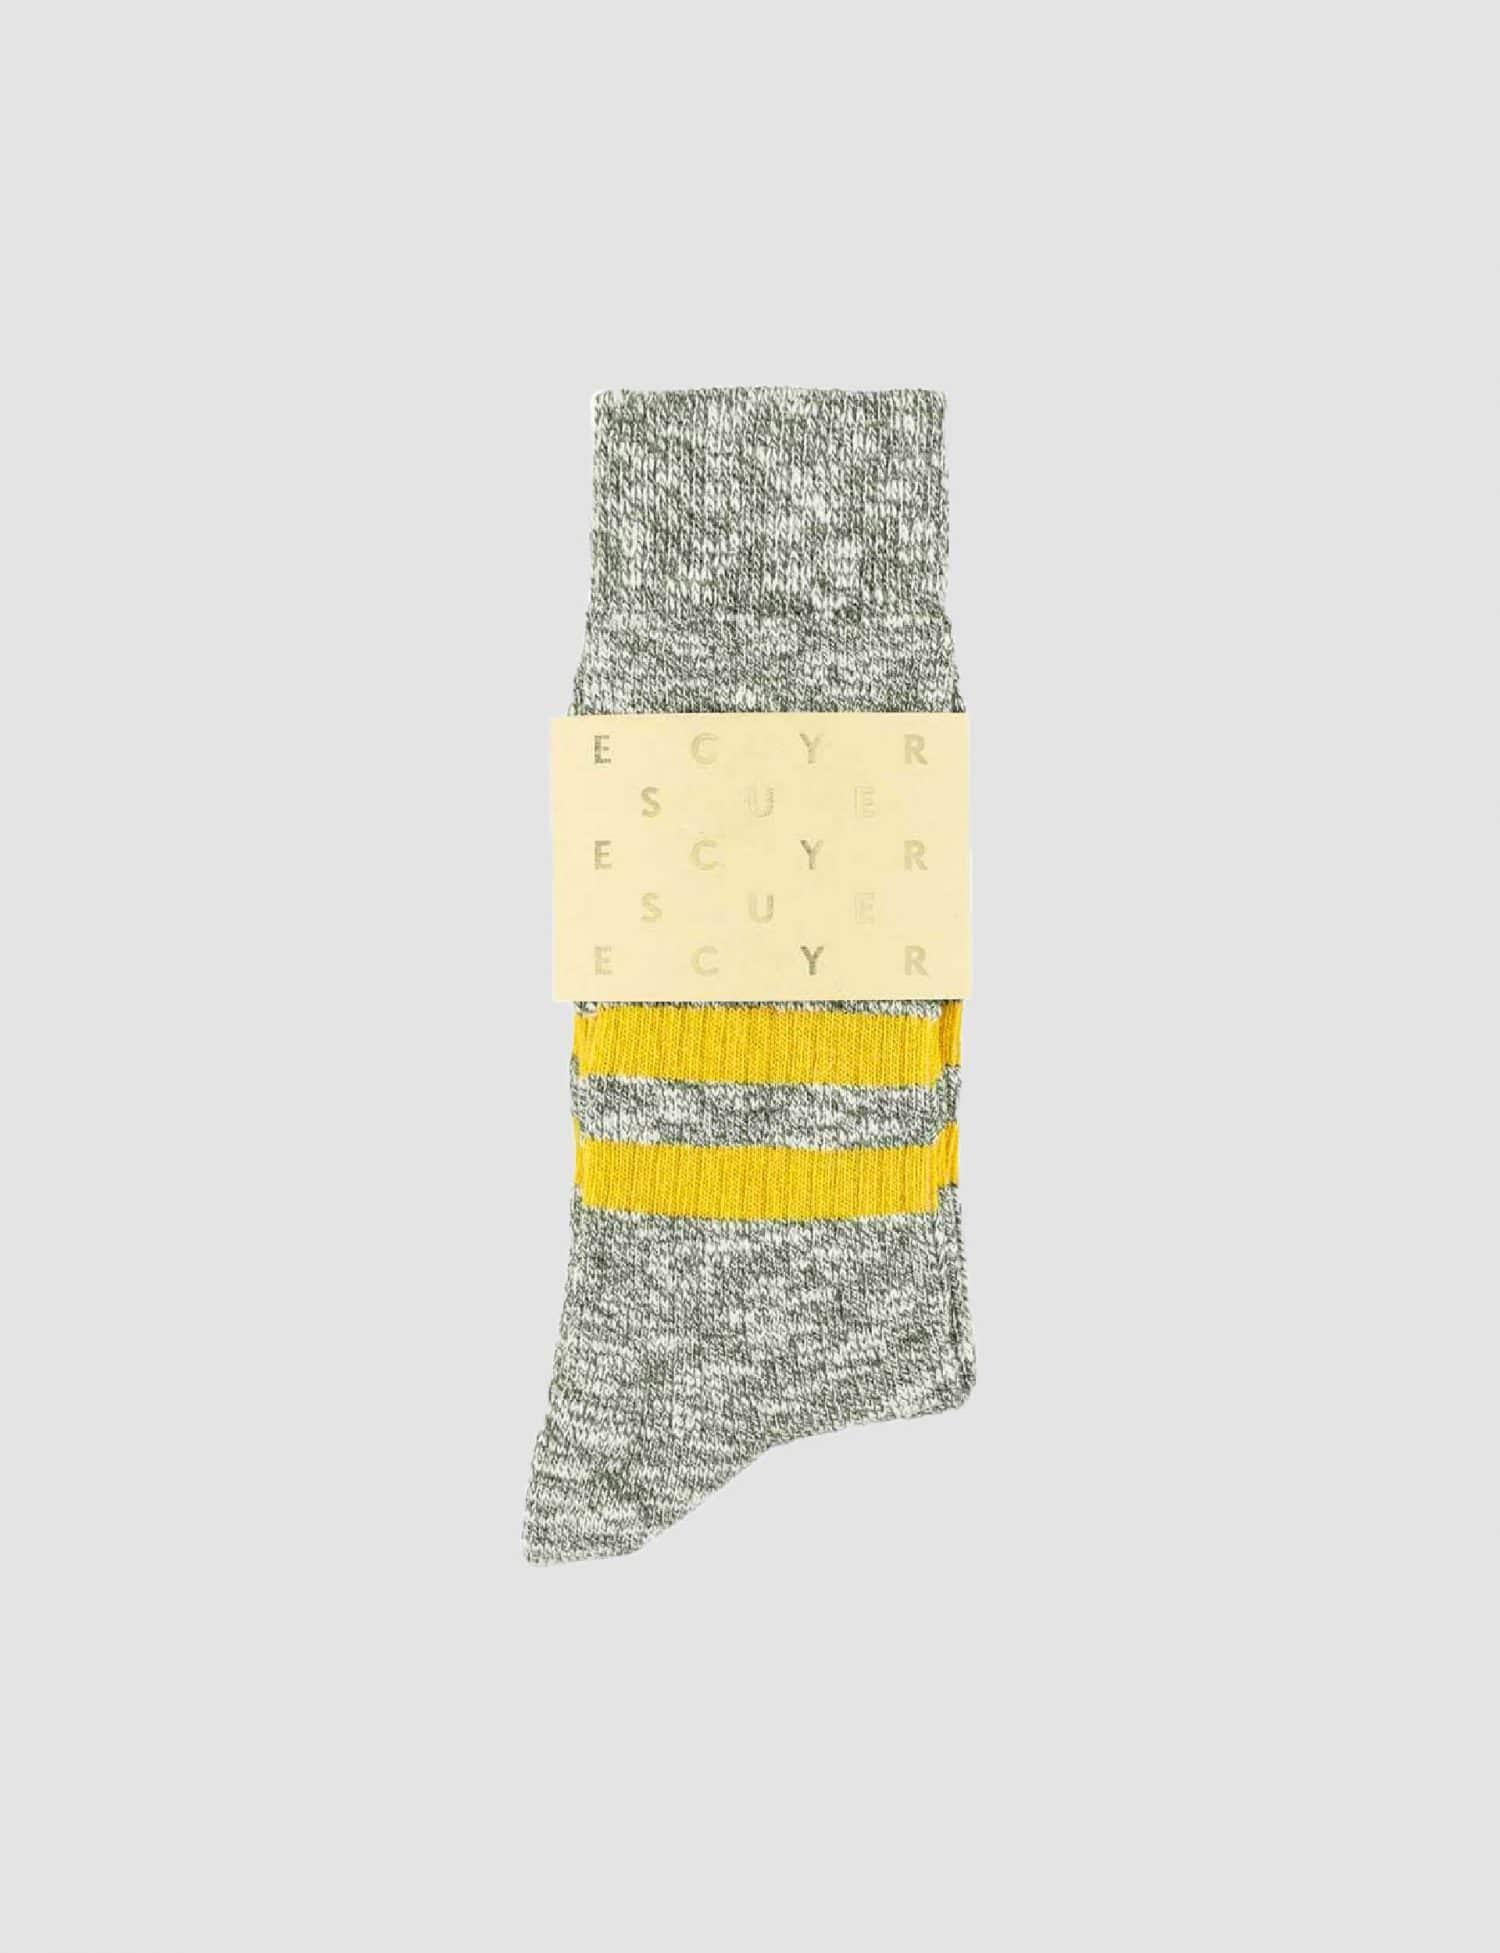 Escuyer - Stripes - Mustard